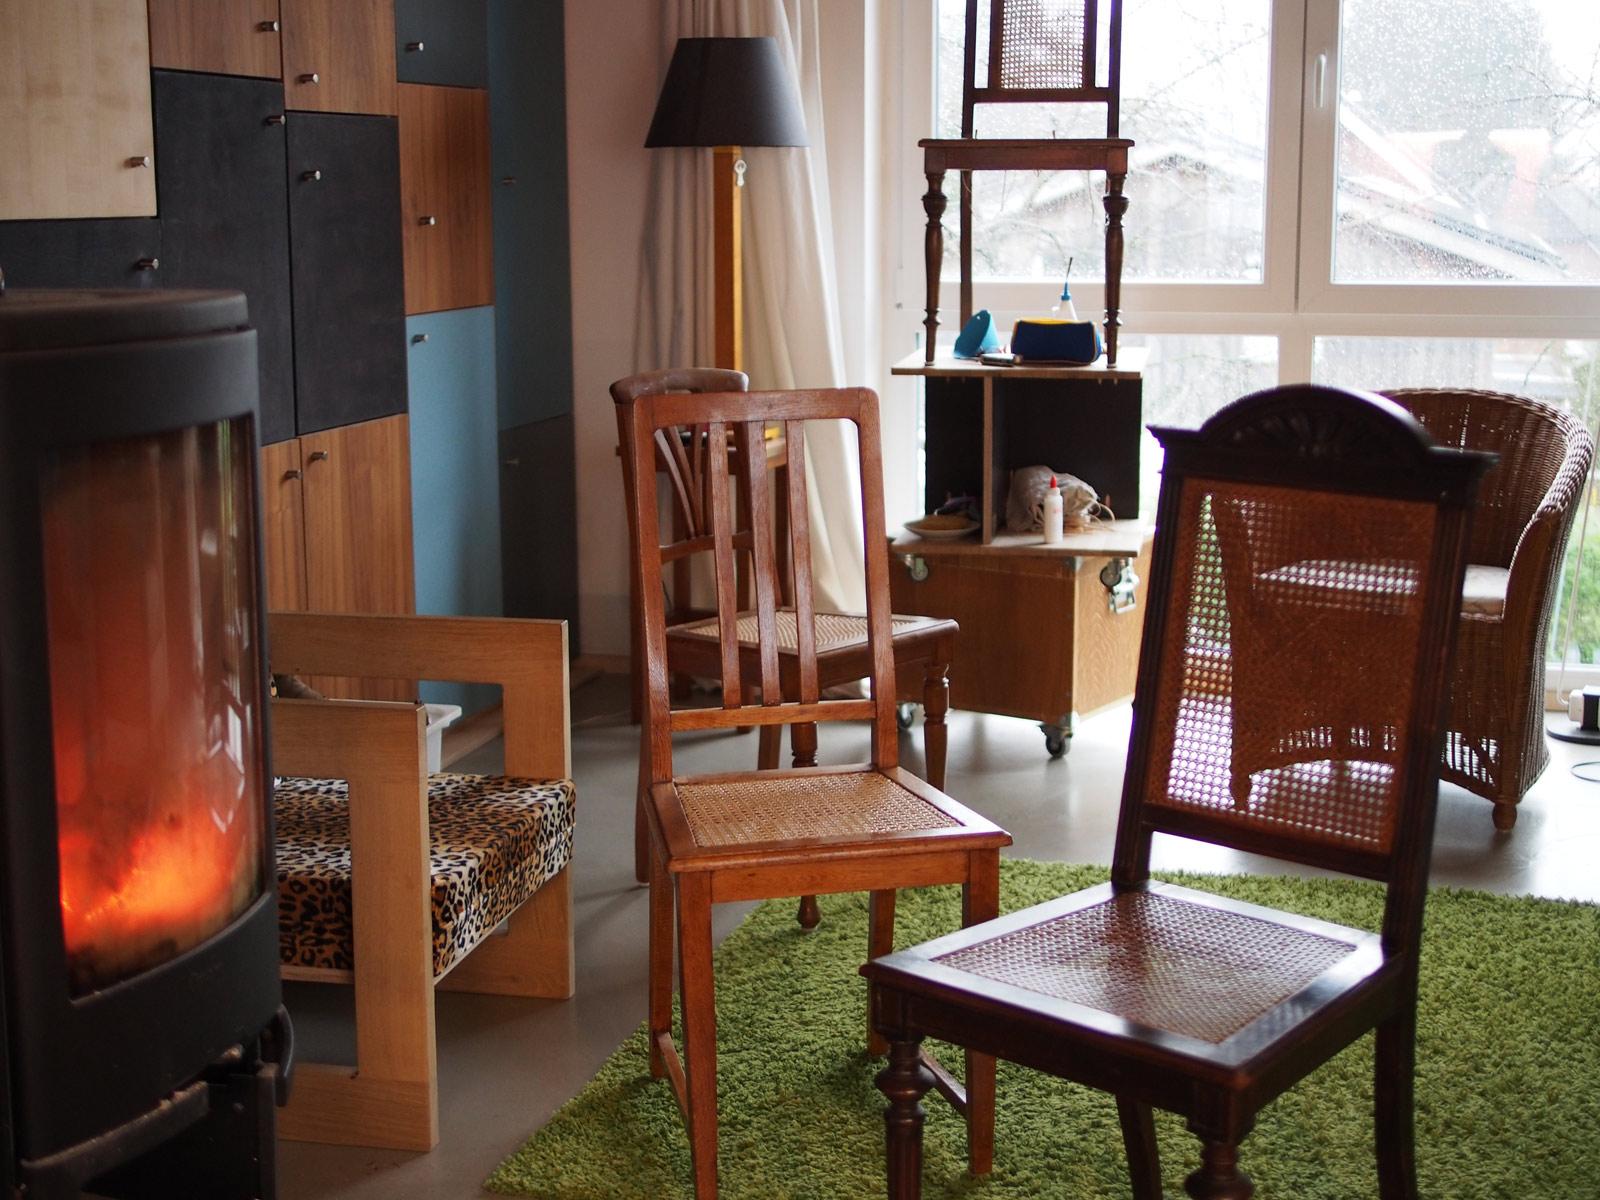 st hle co stuhlgeflecht hamburg boris rogawski. Black Bedroom Furniture Sets. Home Design Ideas